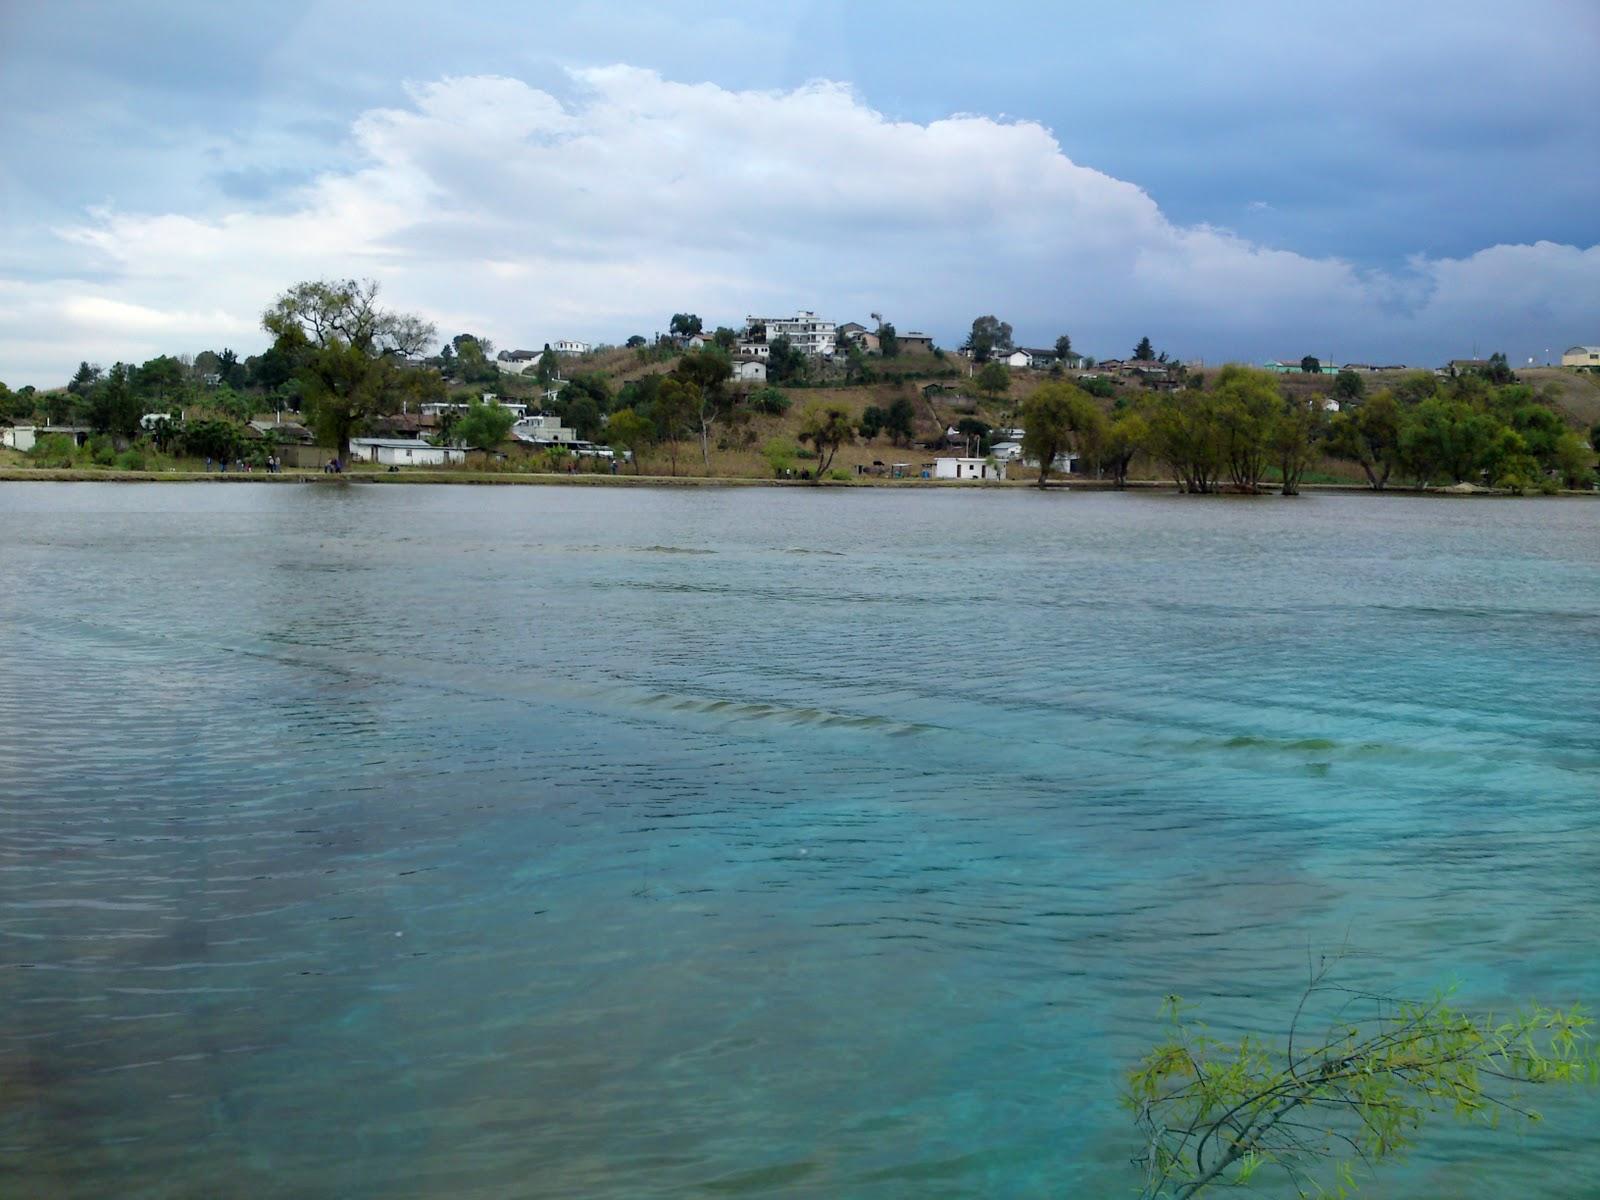 Resultado de imagen para Laguna Las Garzas, San Antonio Ilotenango